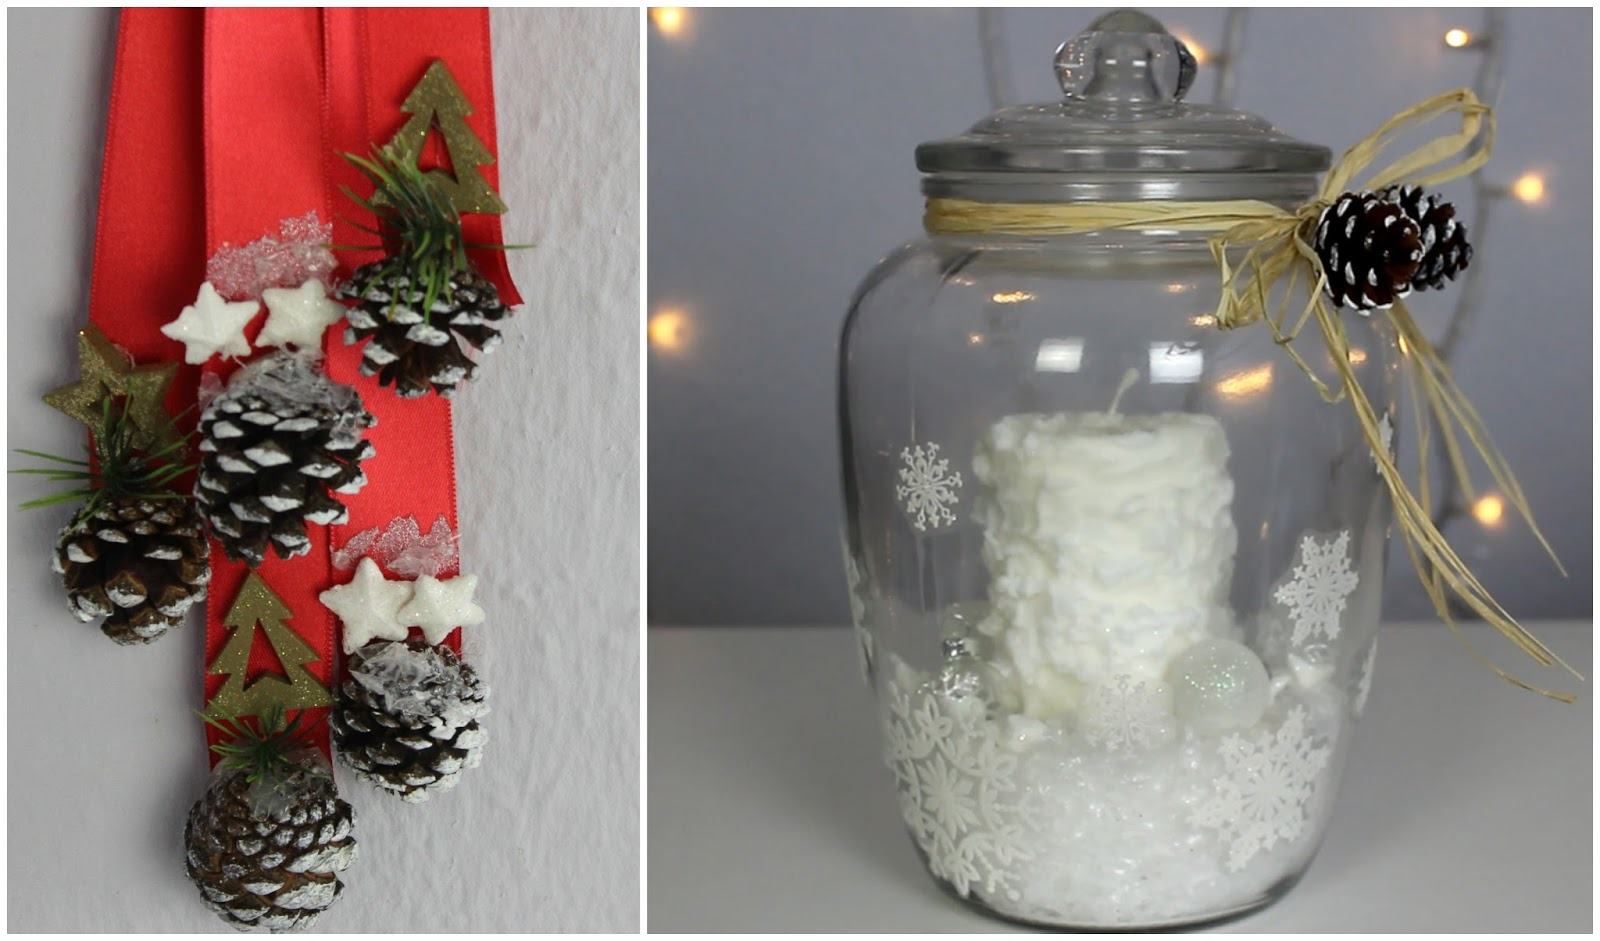 Rain bows and fairytales unsere weihnachtsdeko for Nanu nana weihnachtsdeko